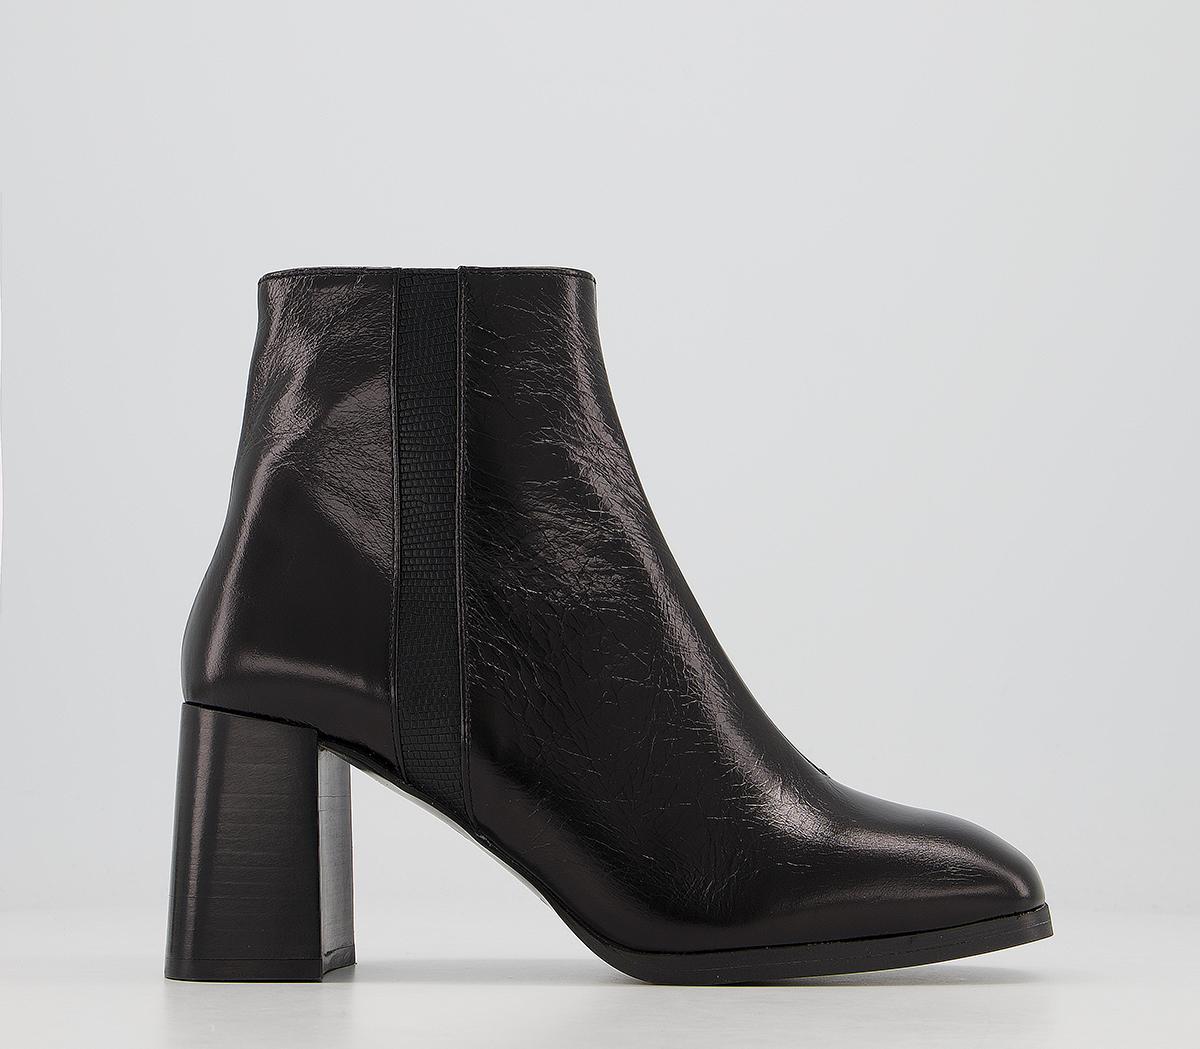 Active Platform Square Toe Boots